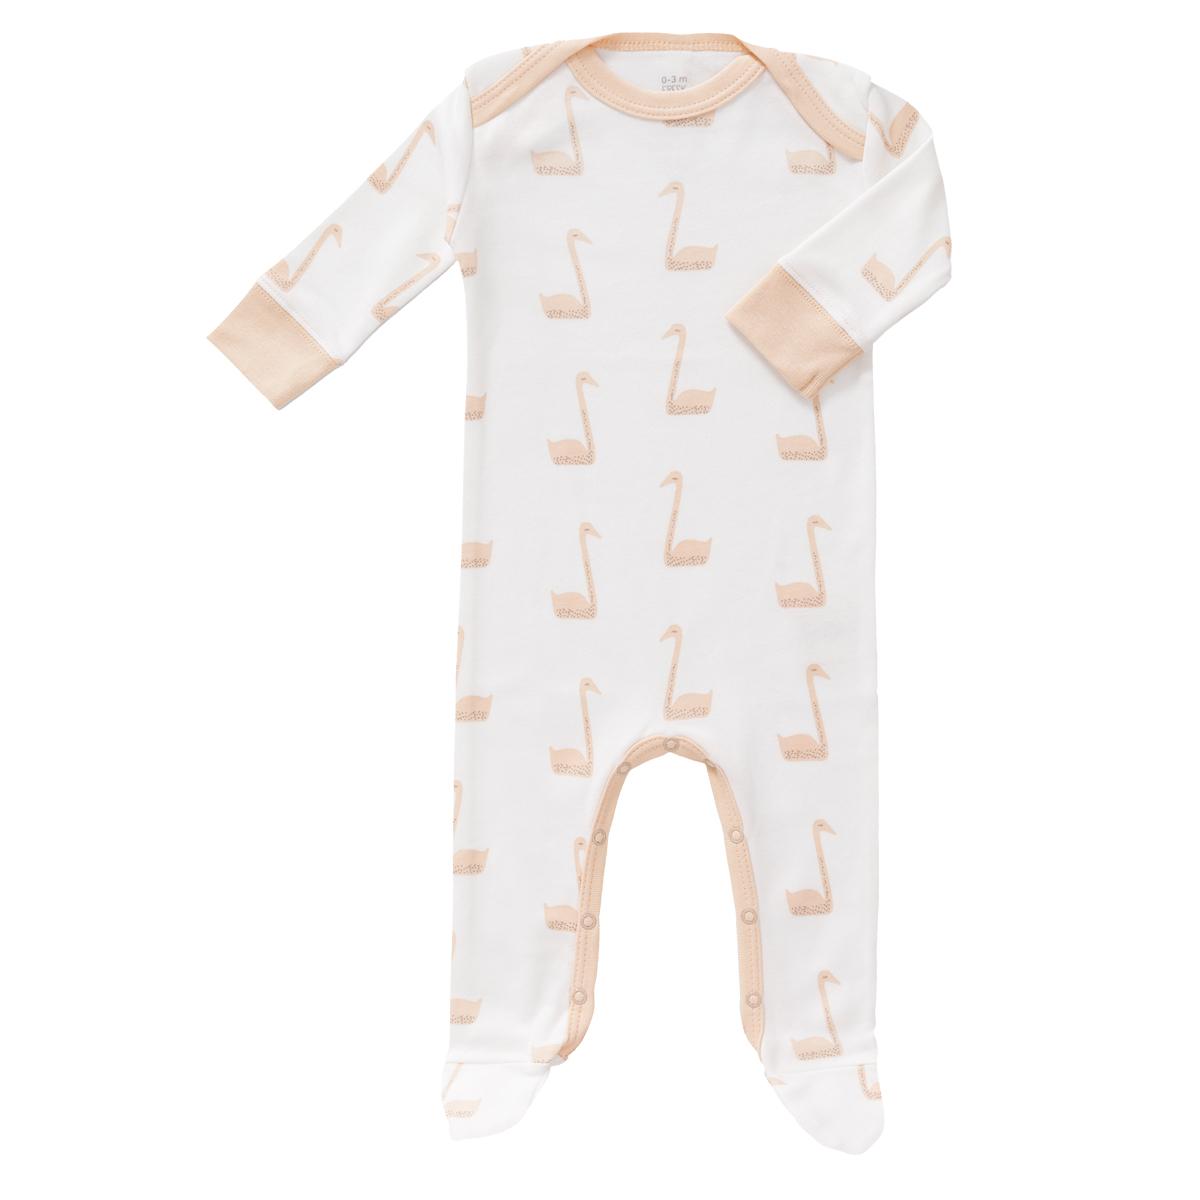 Body & Pyjama Pyjama Cygne - 0/3 Mois Pyjama Cygne - 0/3 Mois